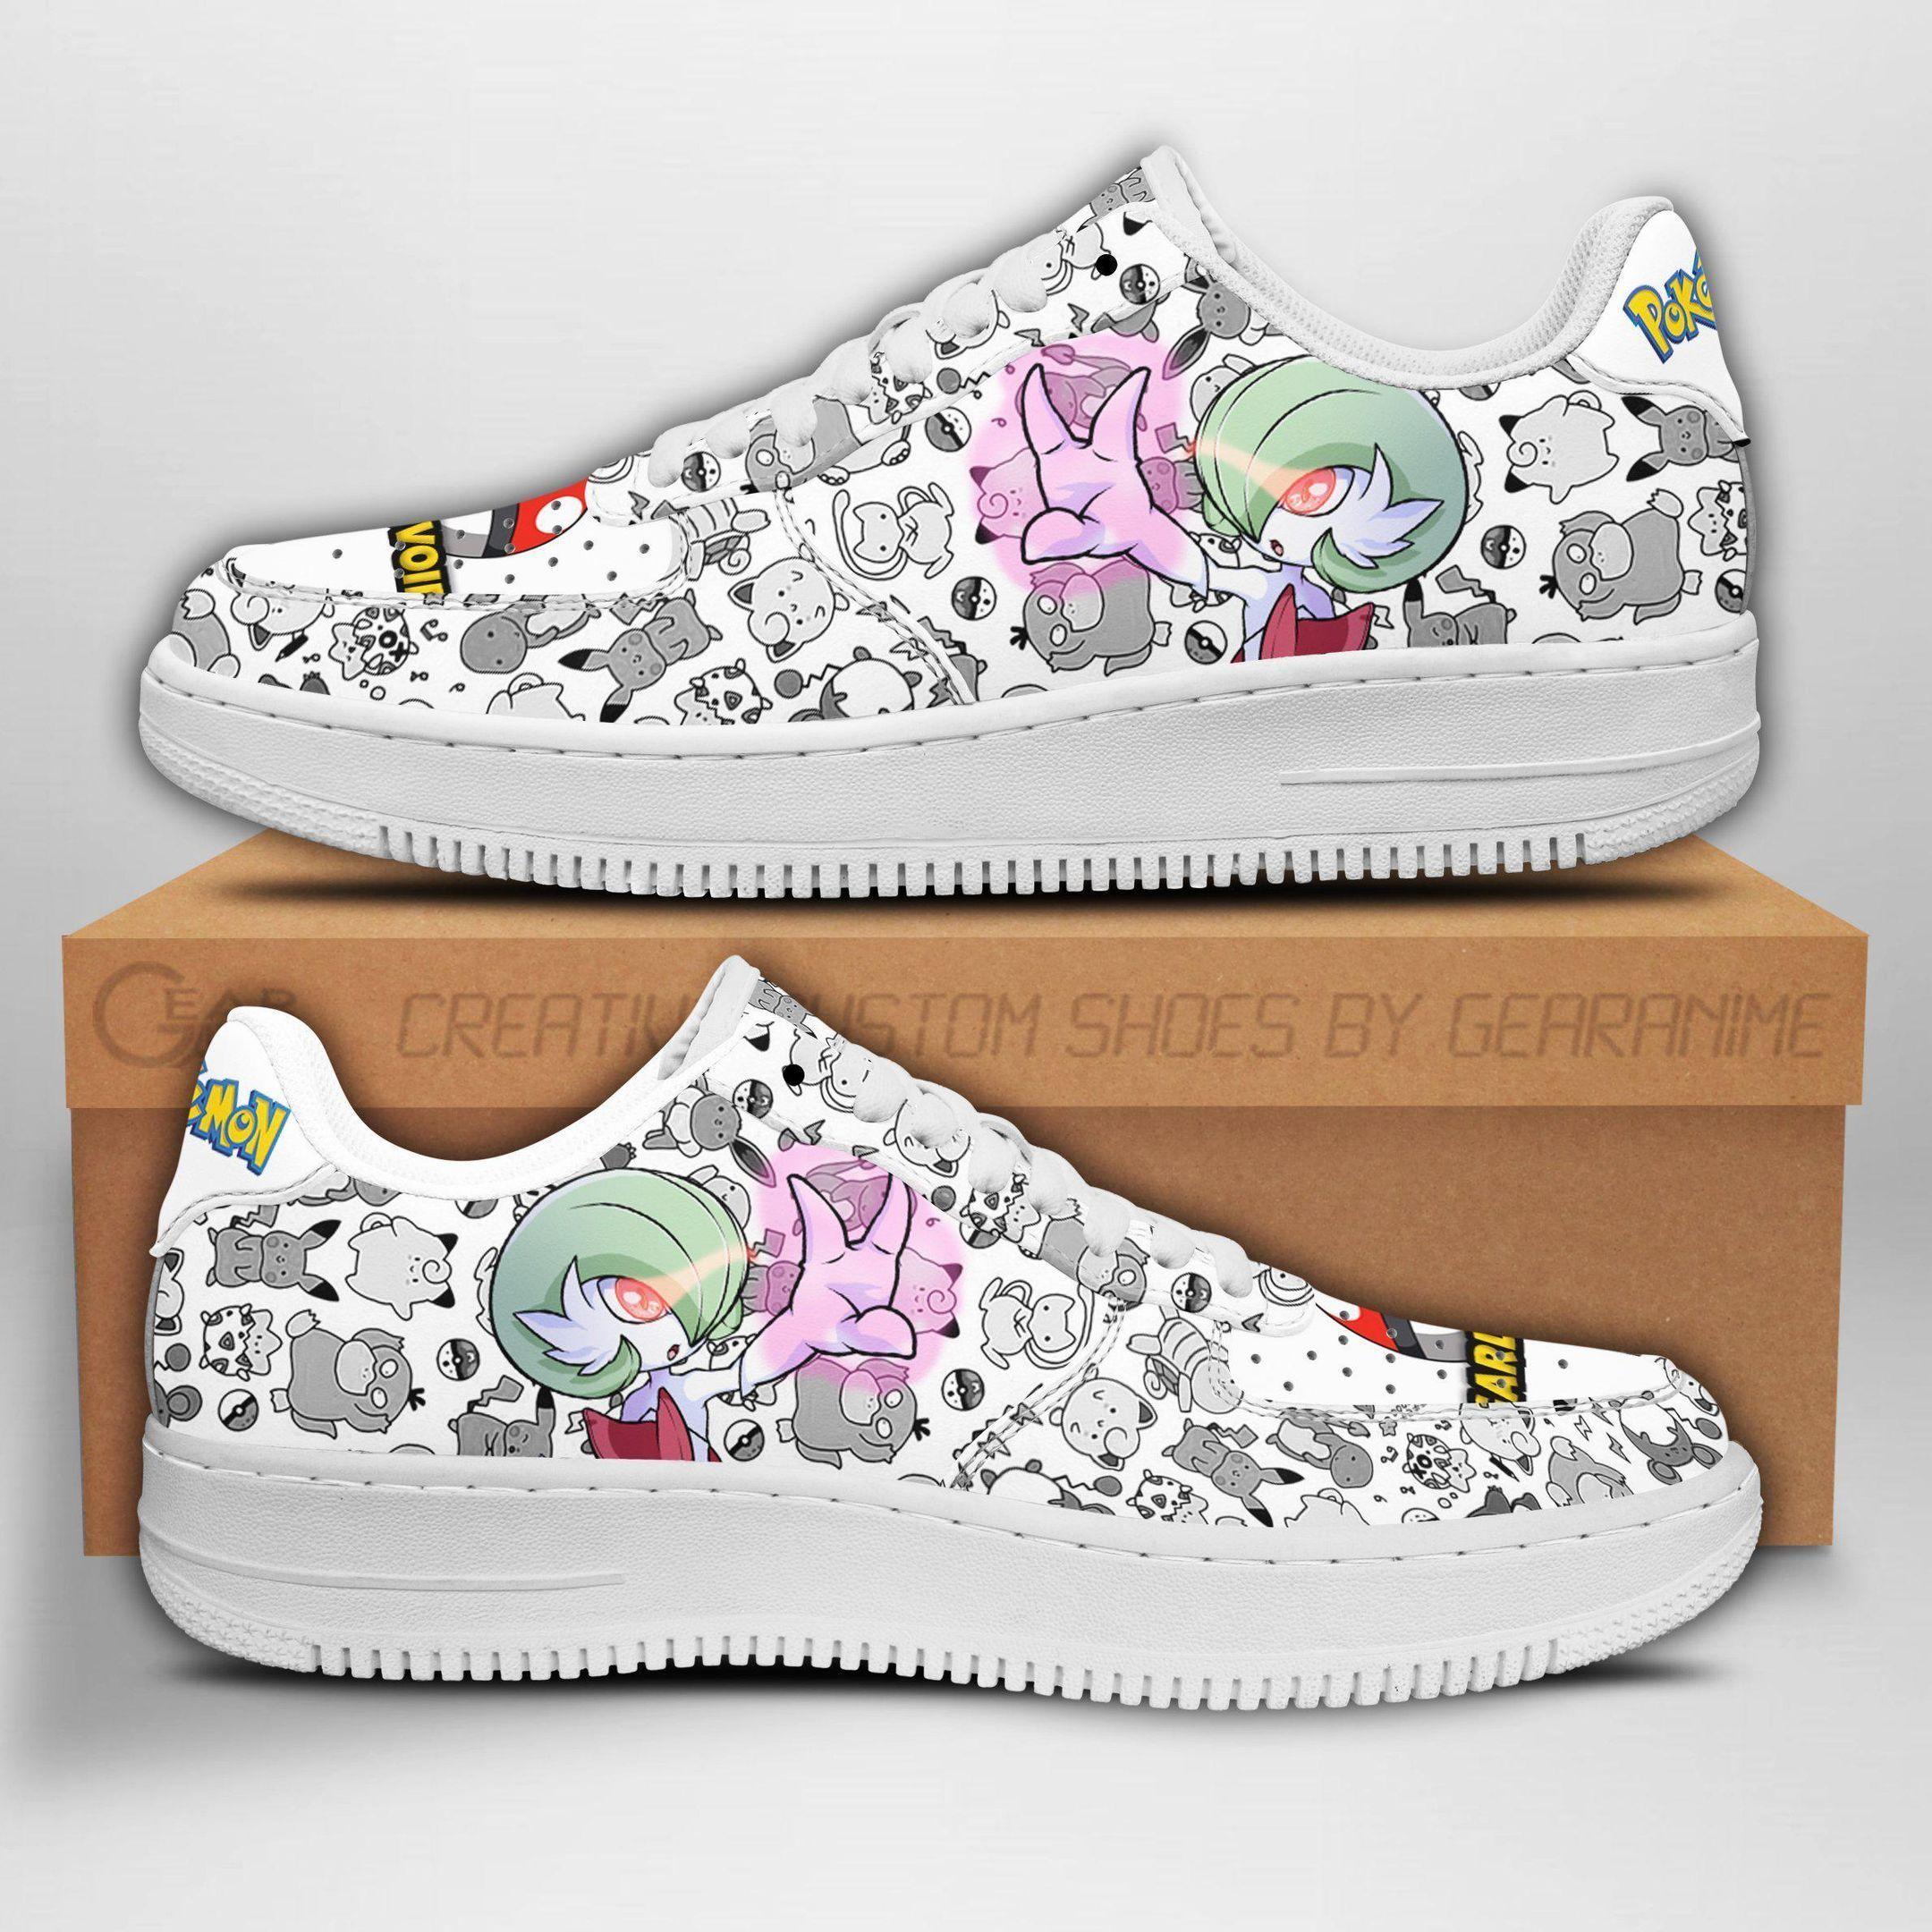 Gardevoir Air Shoes Pokemon Shoes Fan Gift Idea GO1012